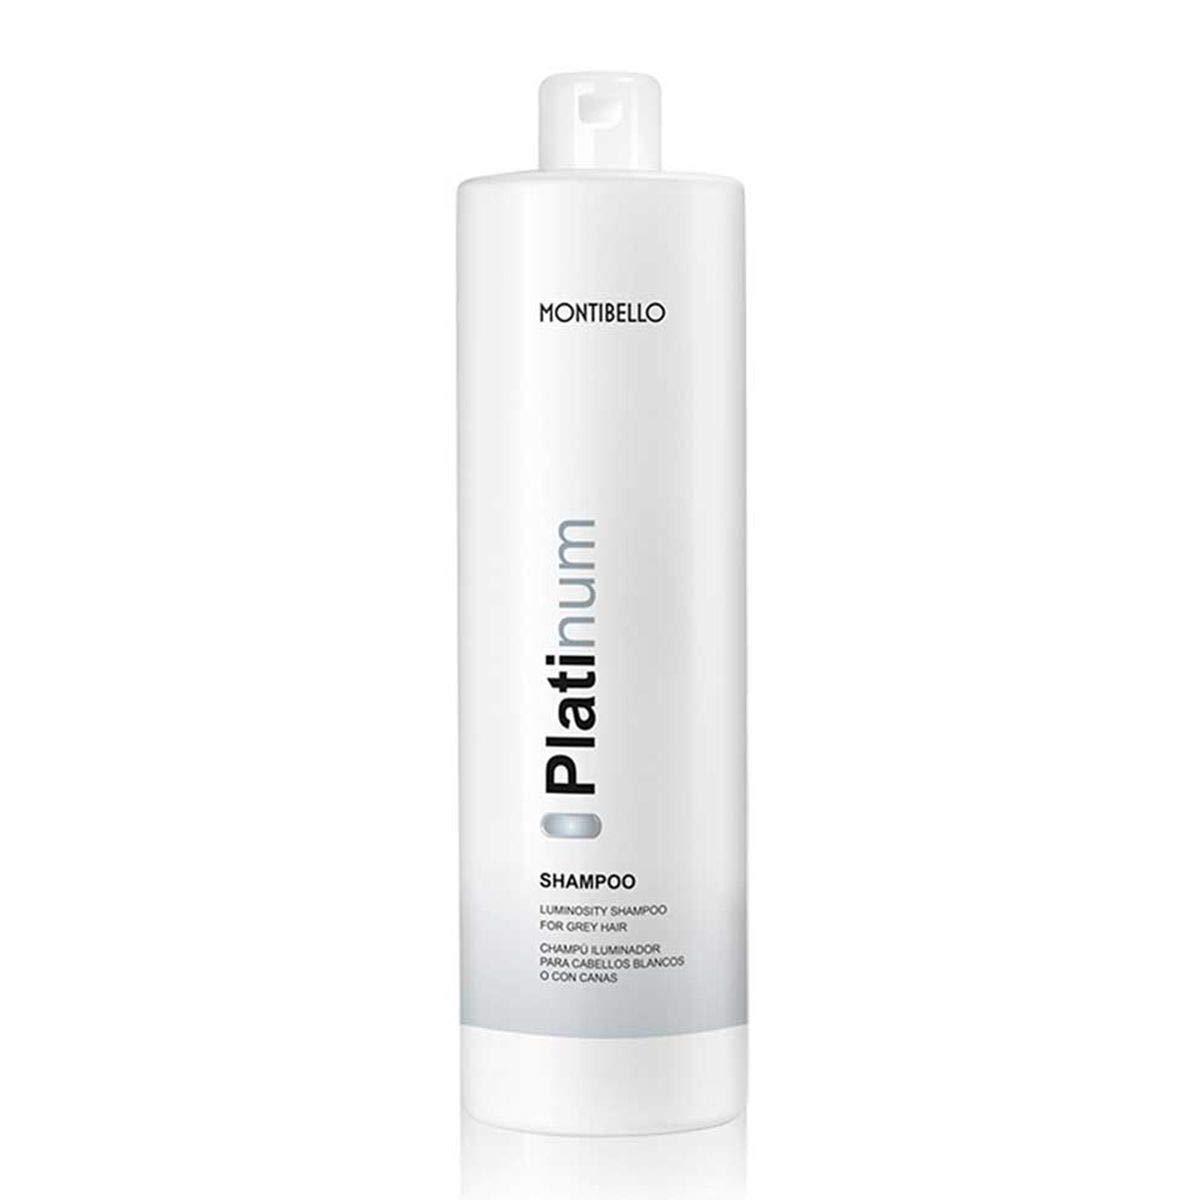 Montibel-Lo Platinum, Champú para Canas, 1000 ml